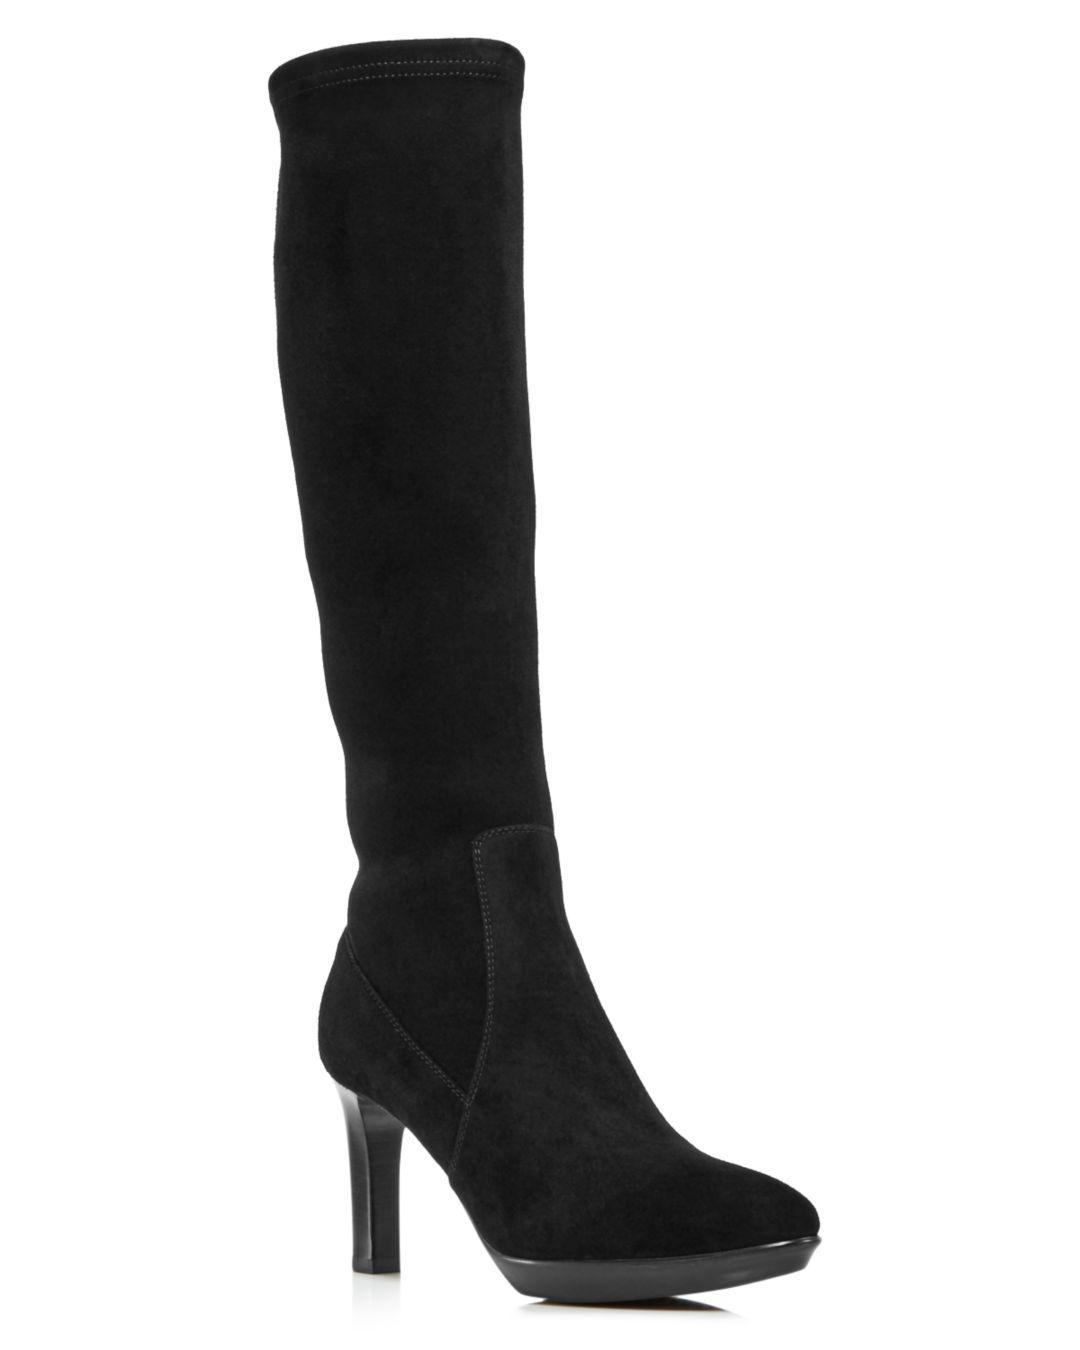 2208b7d26c7 Lyst - Aquatalia Women s Rhumba Tall Suede High-heel Boots in Black